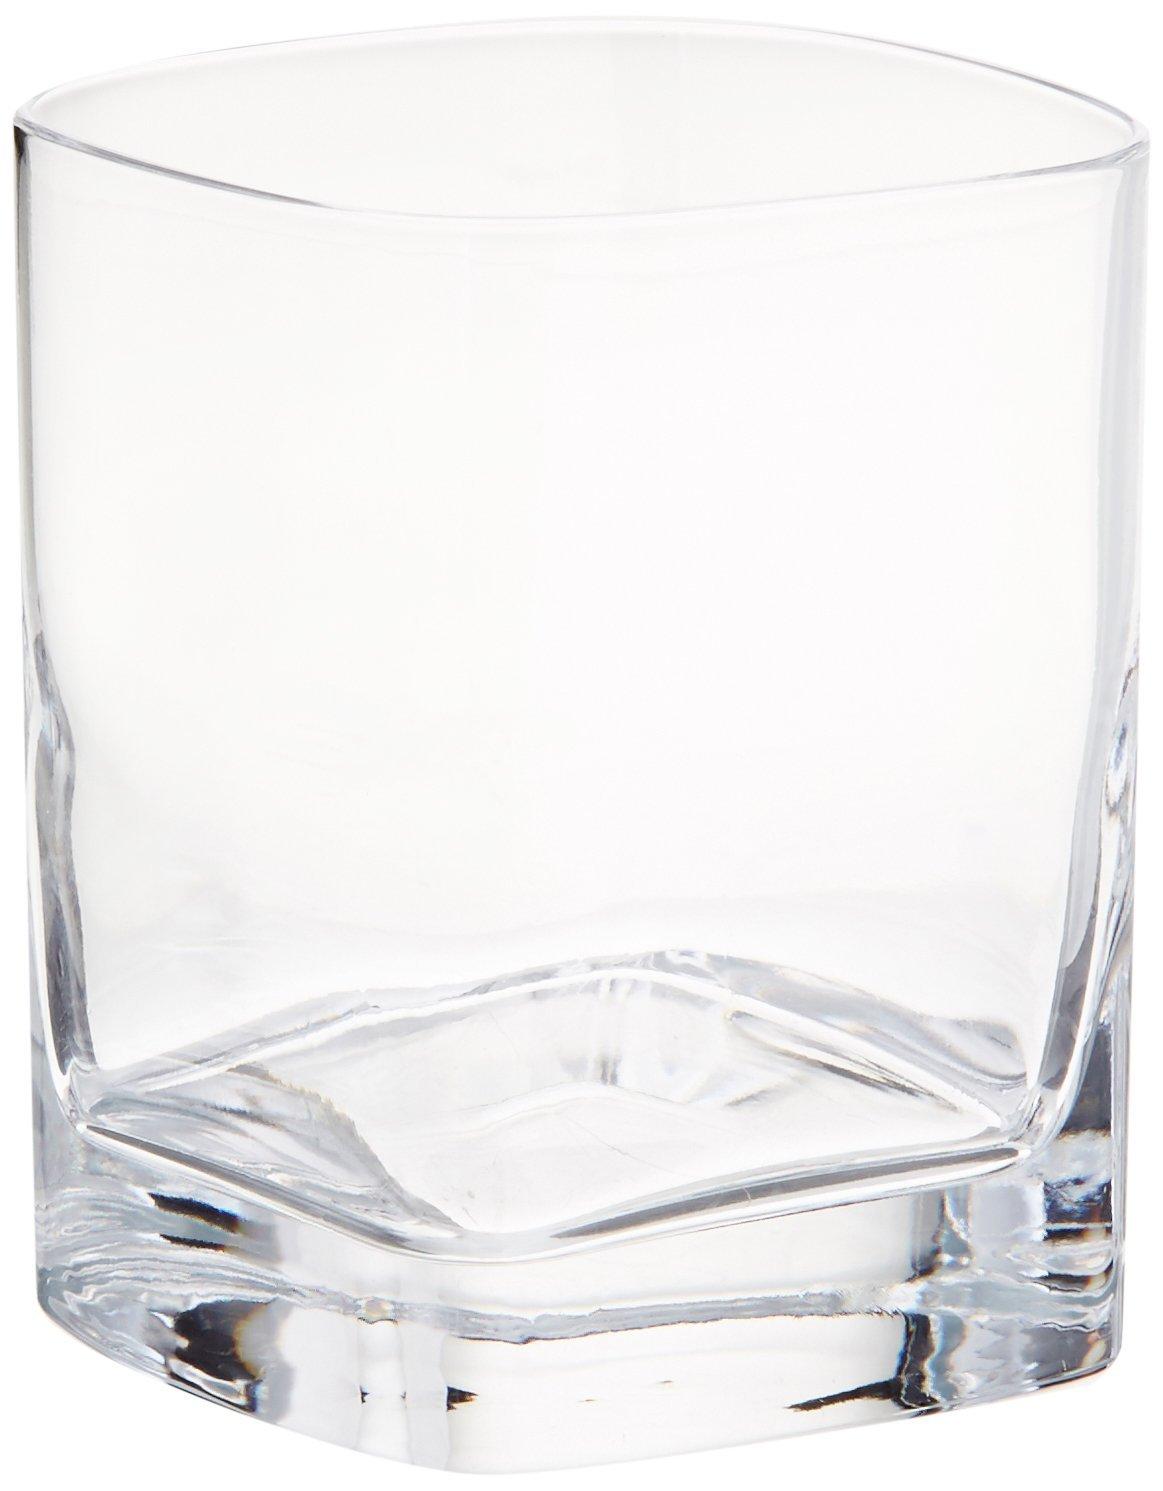 Luigi Bormioli 09830/06 Strauss 9 oz Whisky Rocks Glasses, Set of 6, Clear